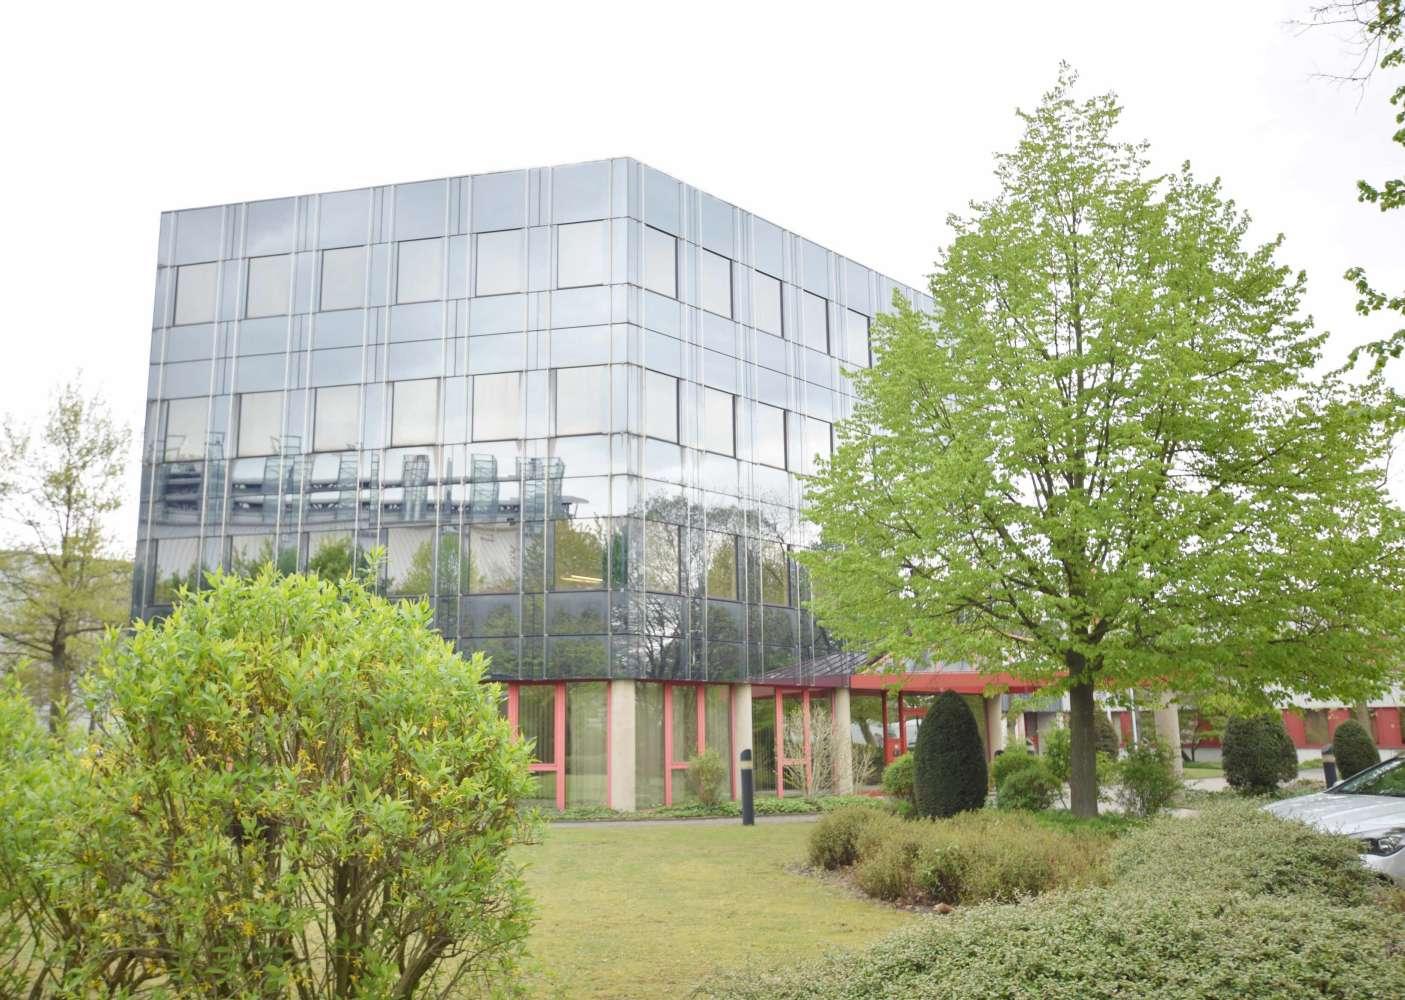 Büros Krefeld, 47807 - Büro - Krefeld, Fischeln - D2604 - 10573612